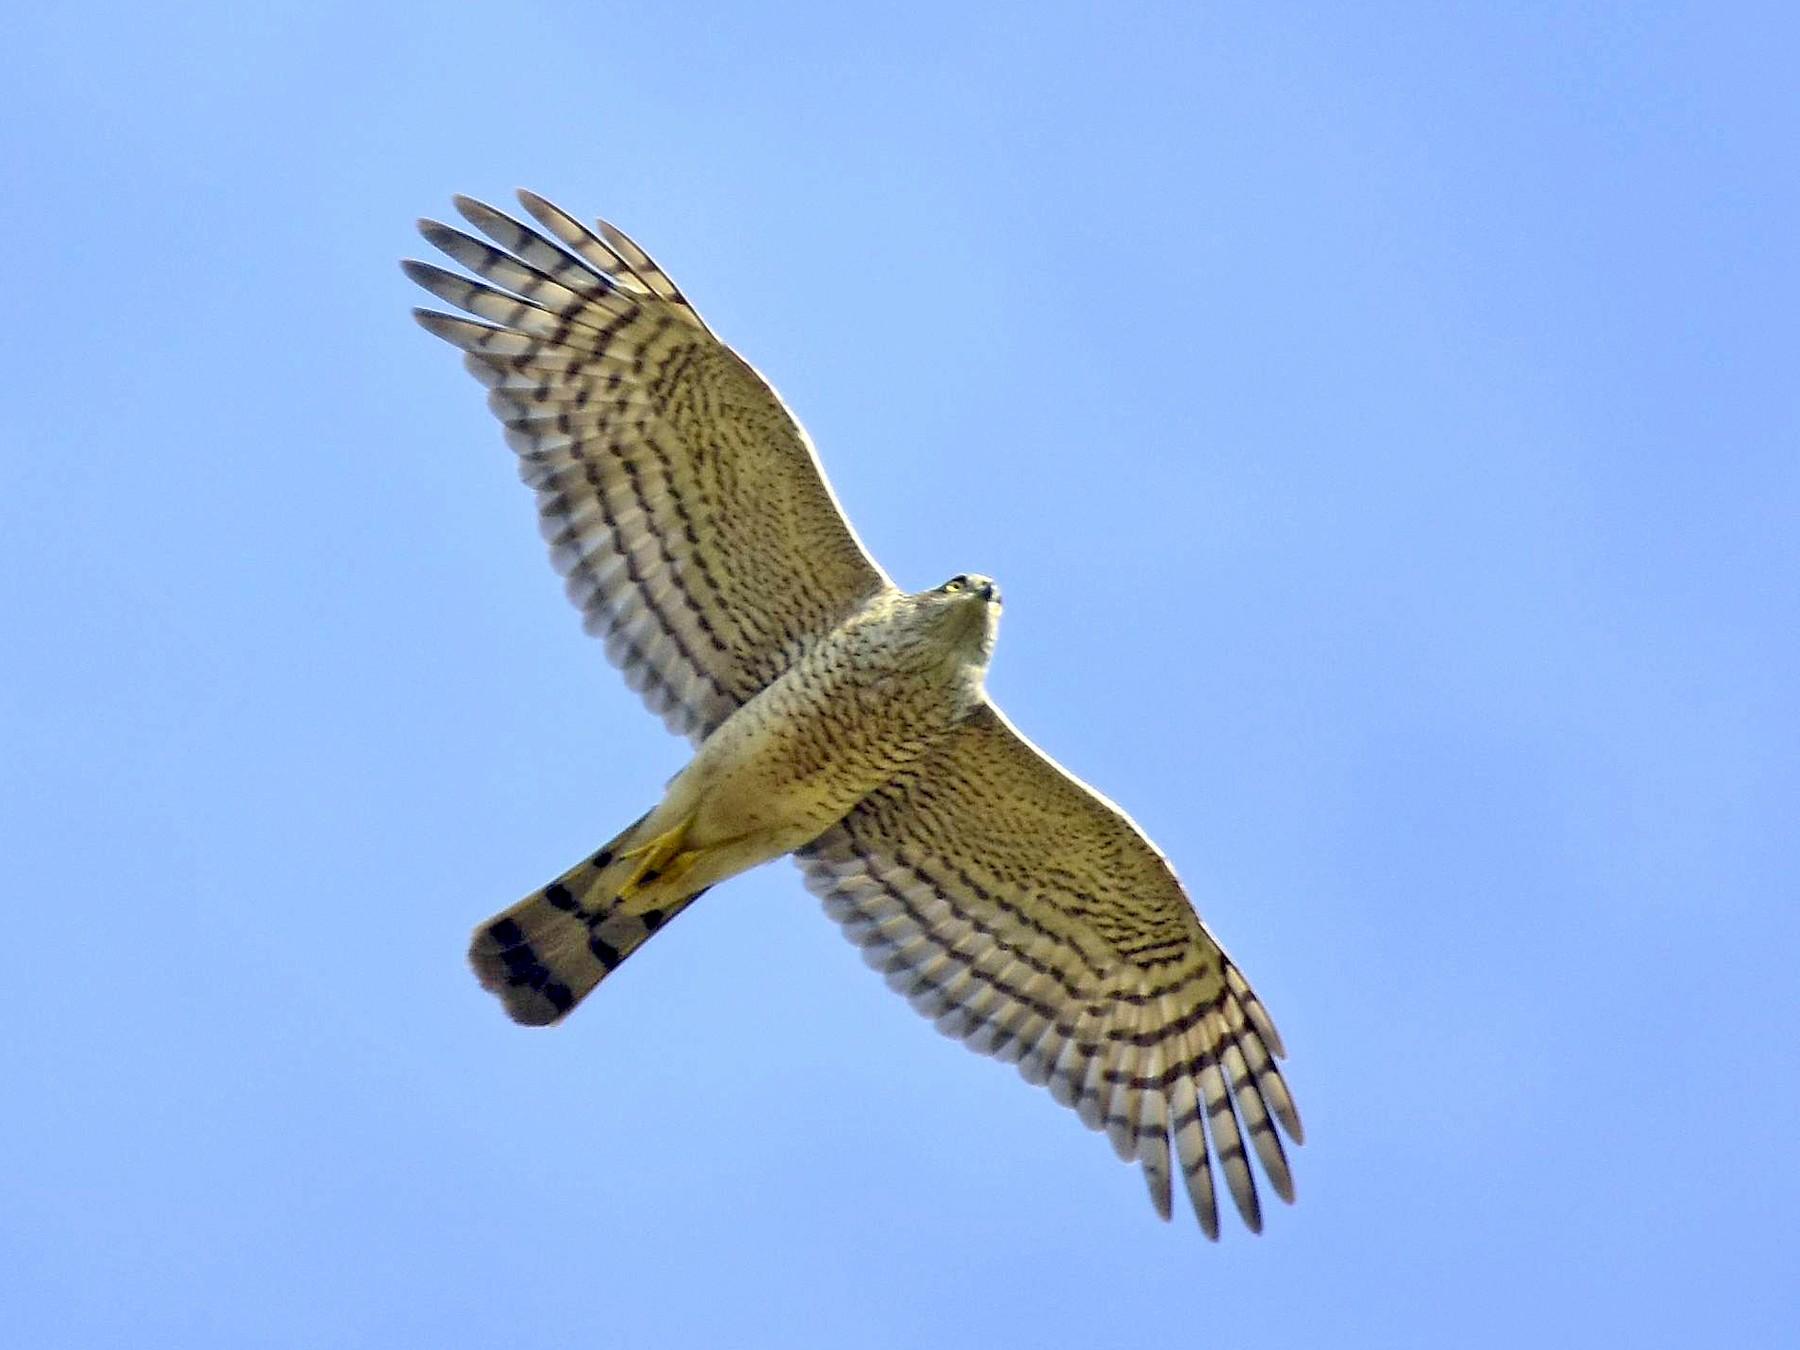 Eurasian Sparrowhawk - raphy kallettumkara